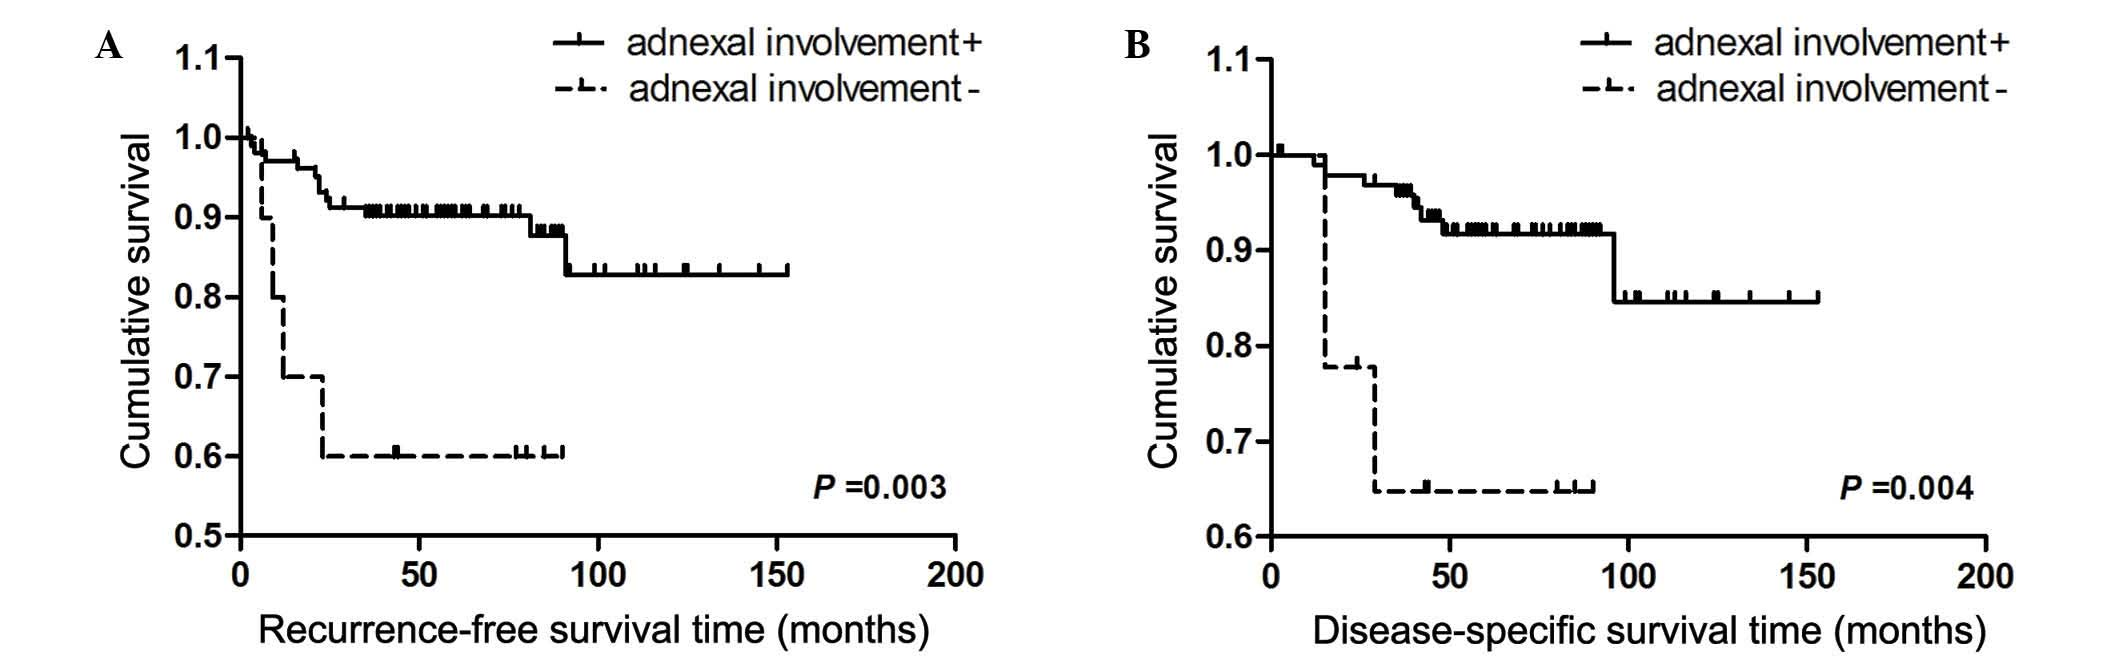 endometrial cancer survival rate)